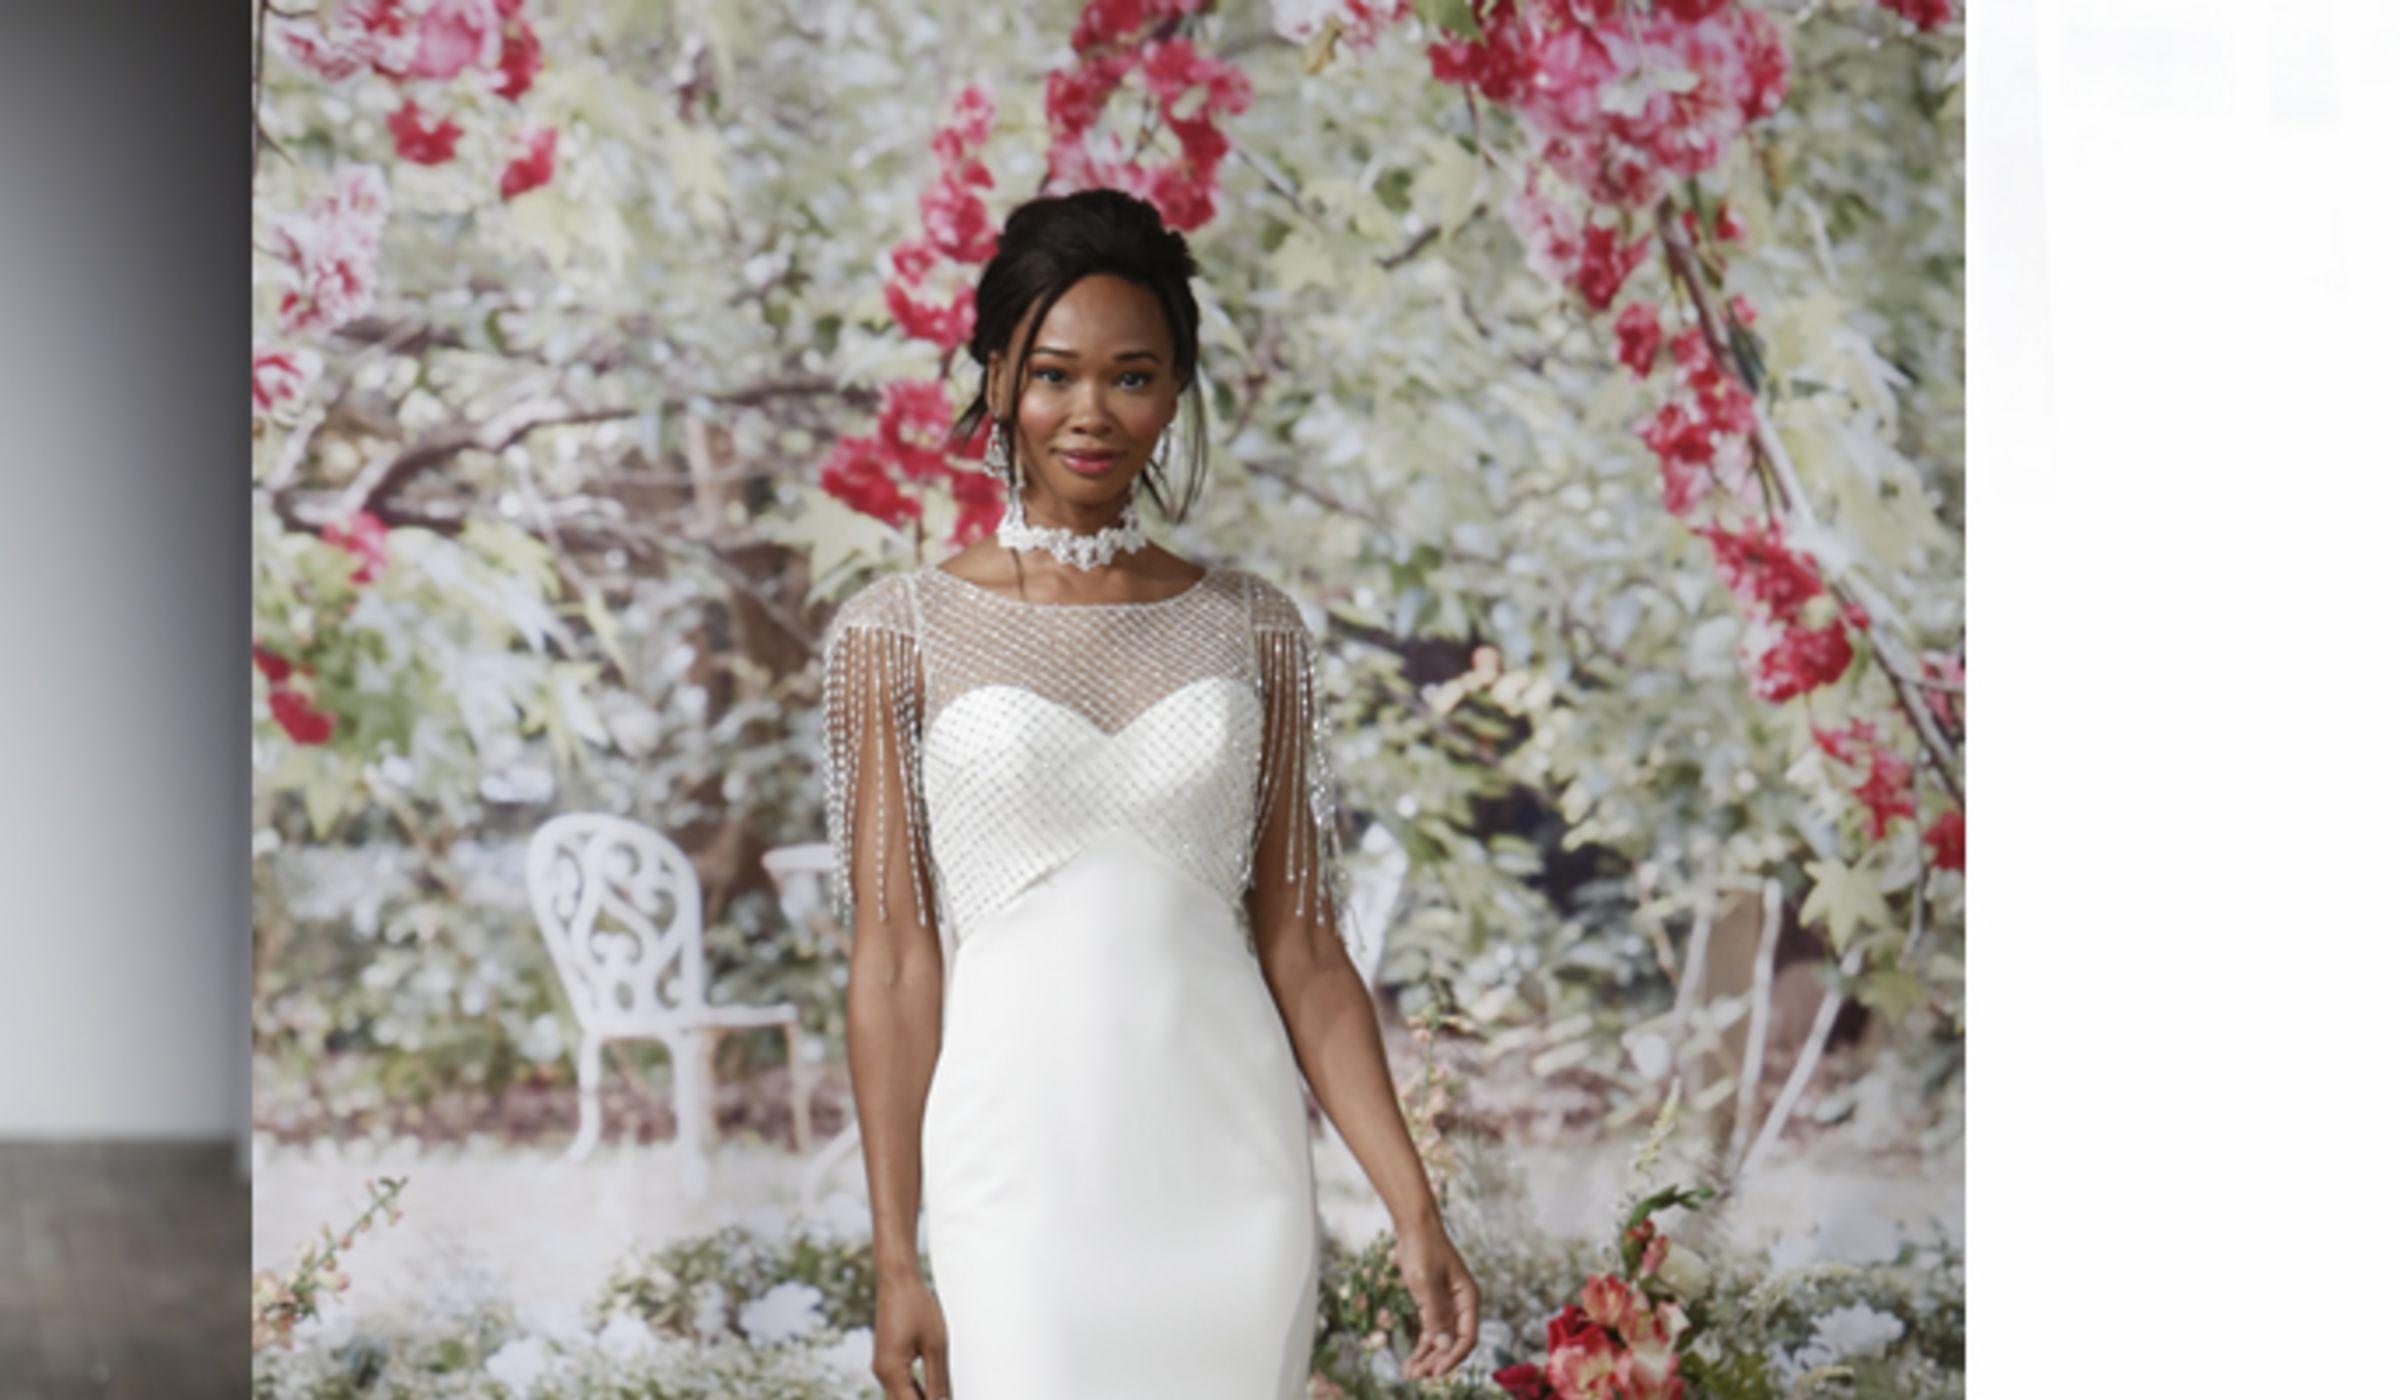 10 amazing las vegas wedding dresses weddingwire for Las vegas wedding dresses